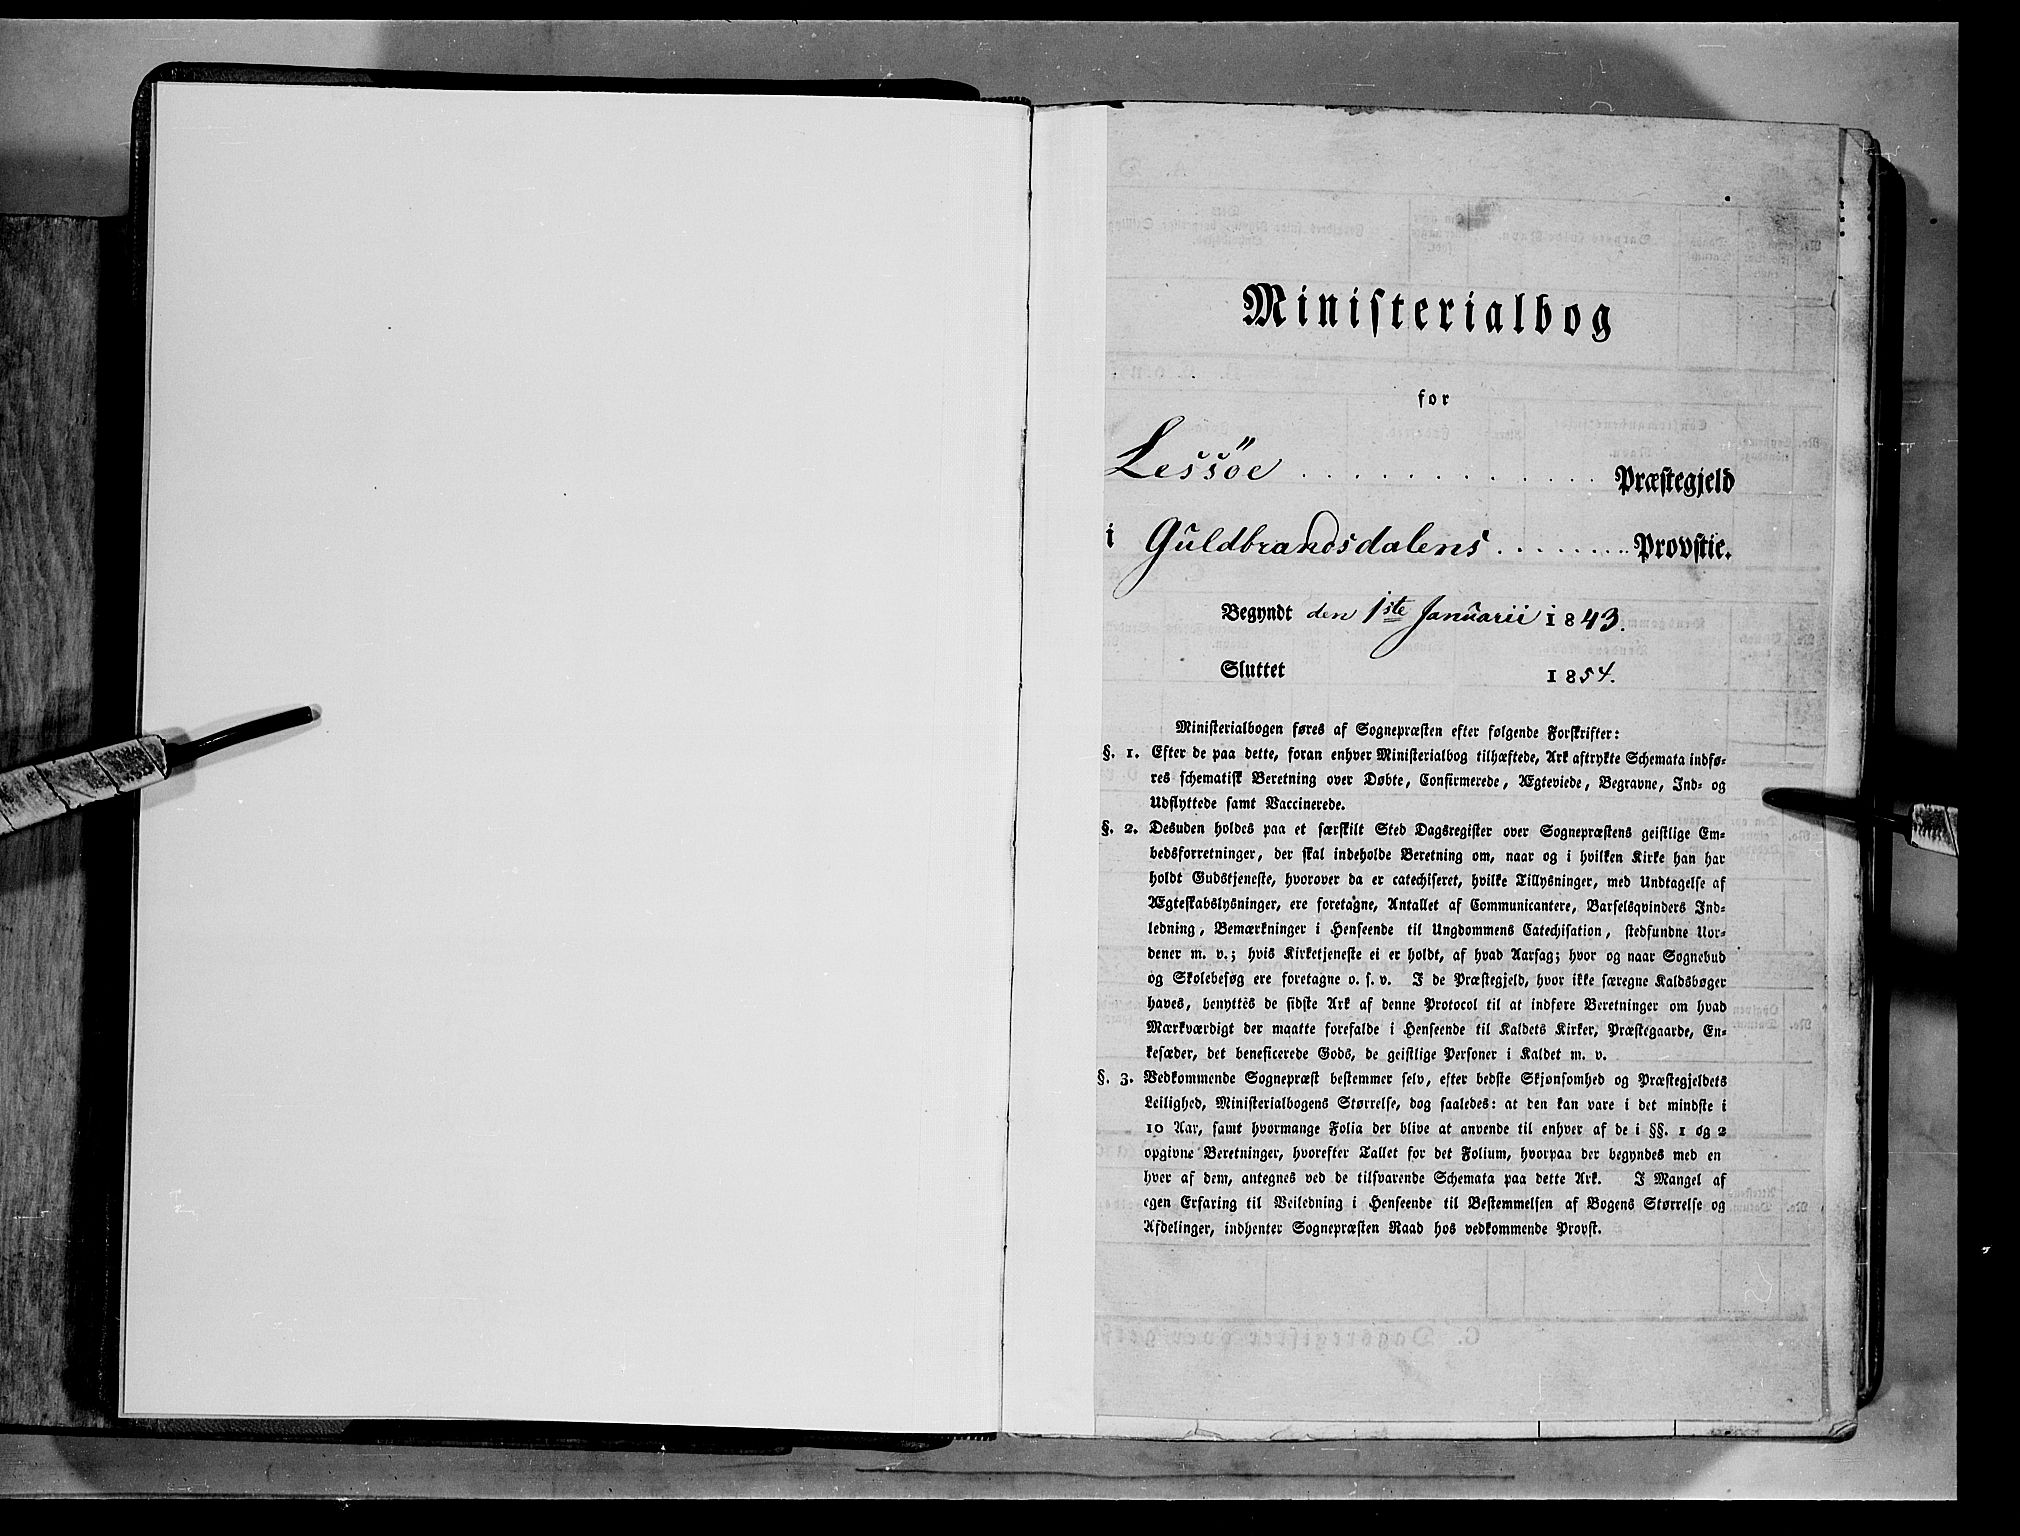 SAH, Lesja prestekontor, Ministerialbok nr. 6A, 1843-1854